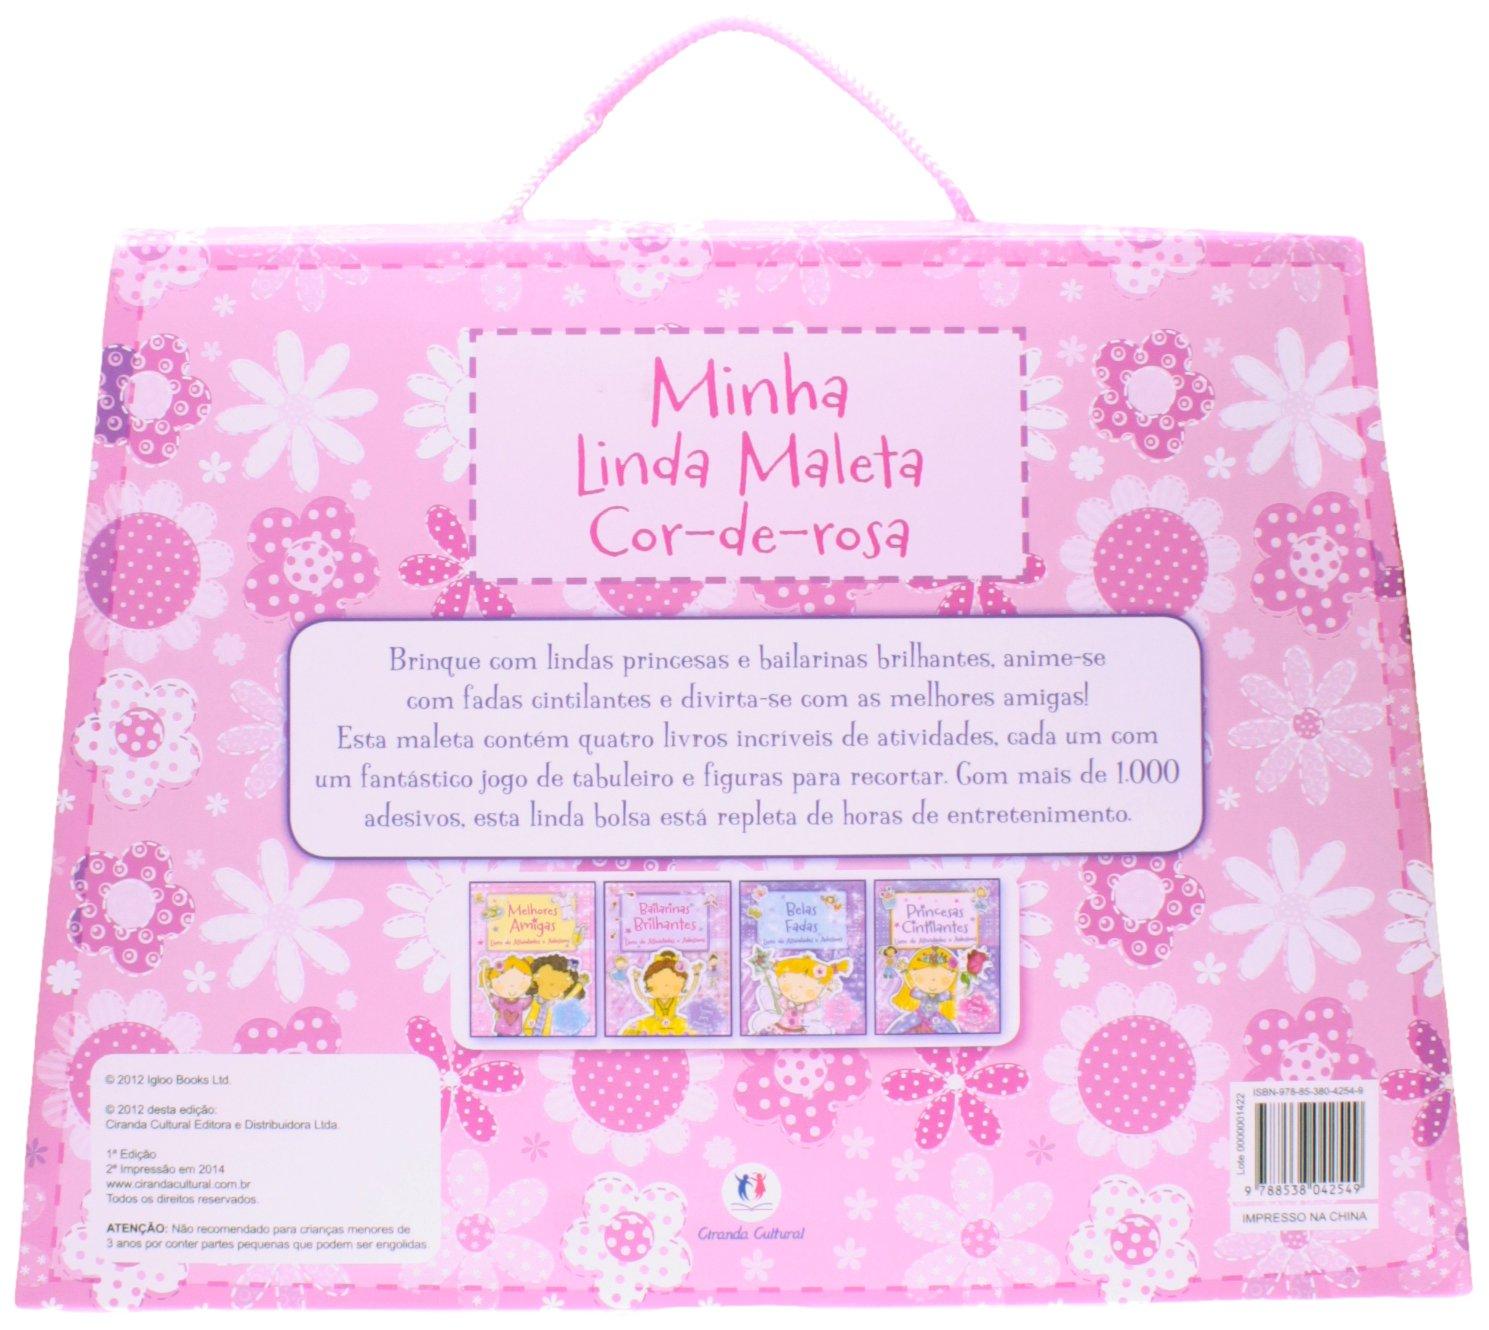 Minha Linda Maleta Cor-de-rosa: Igloo Books, 0: 9788538042549: Amazon.com: Books